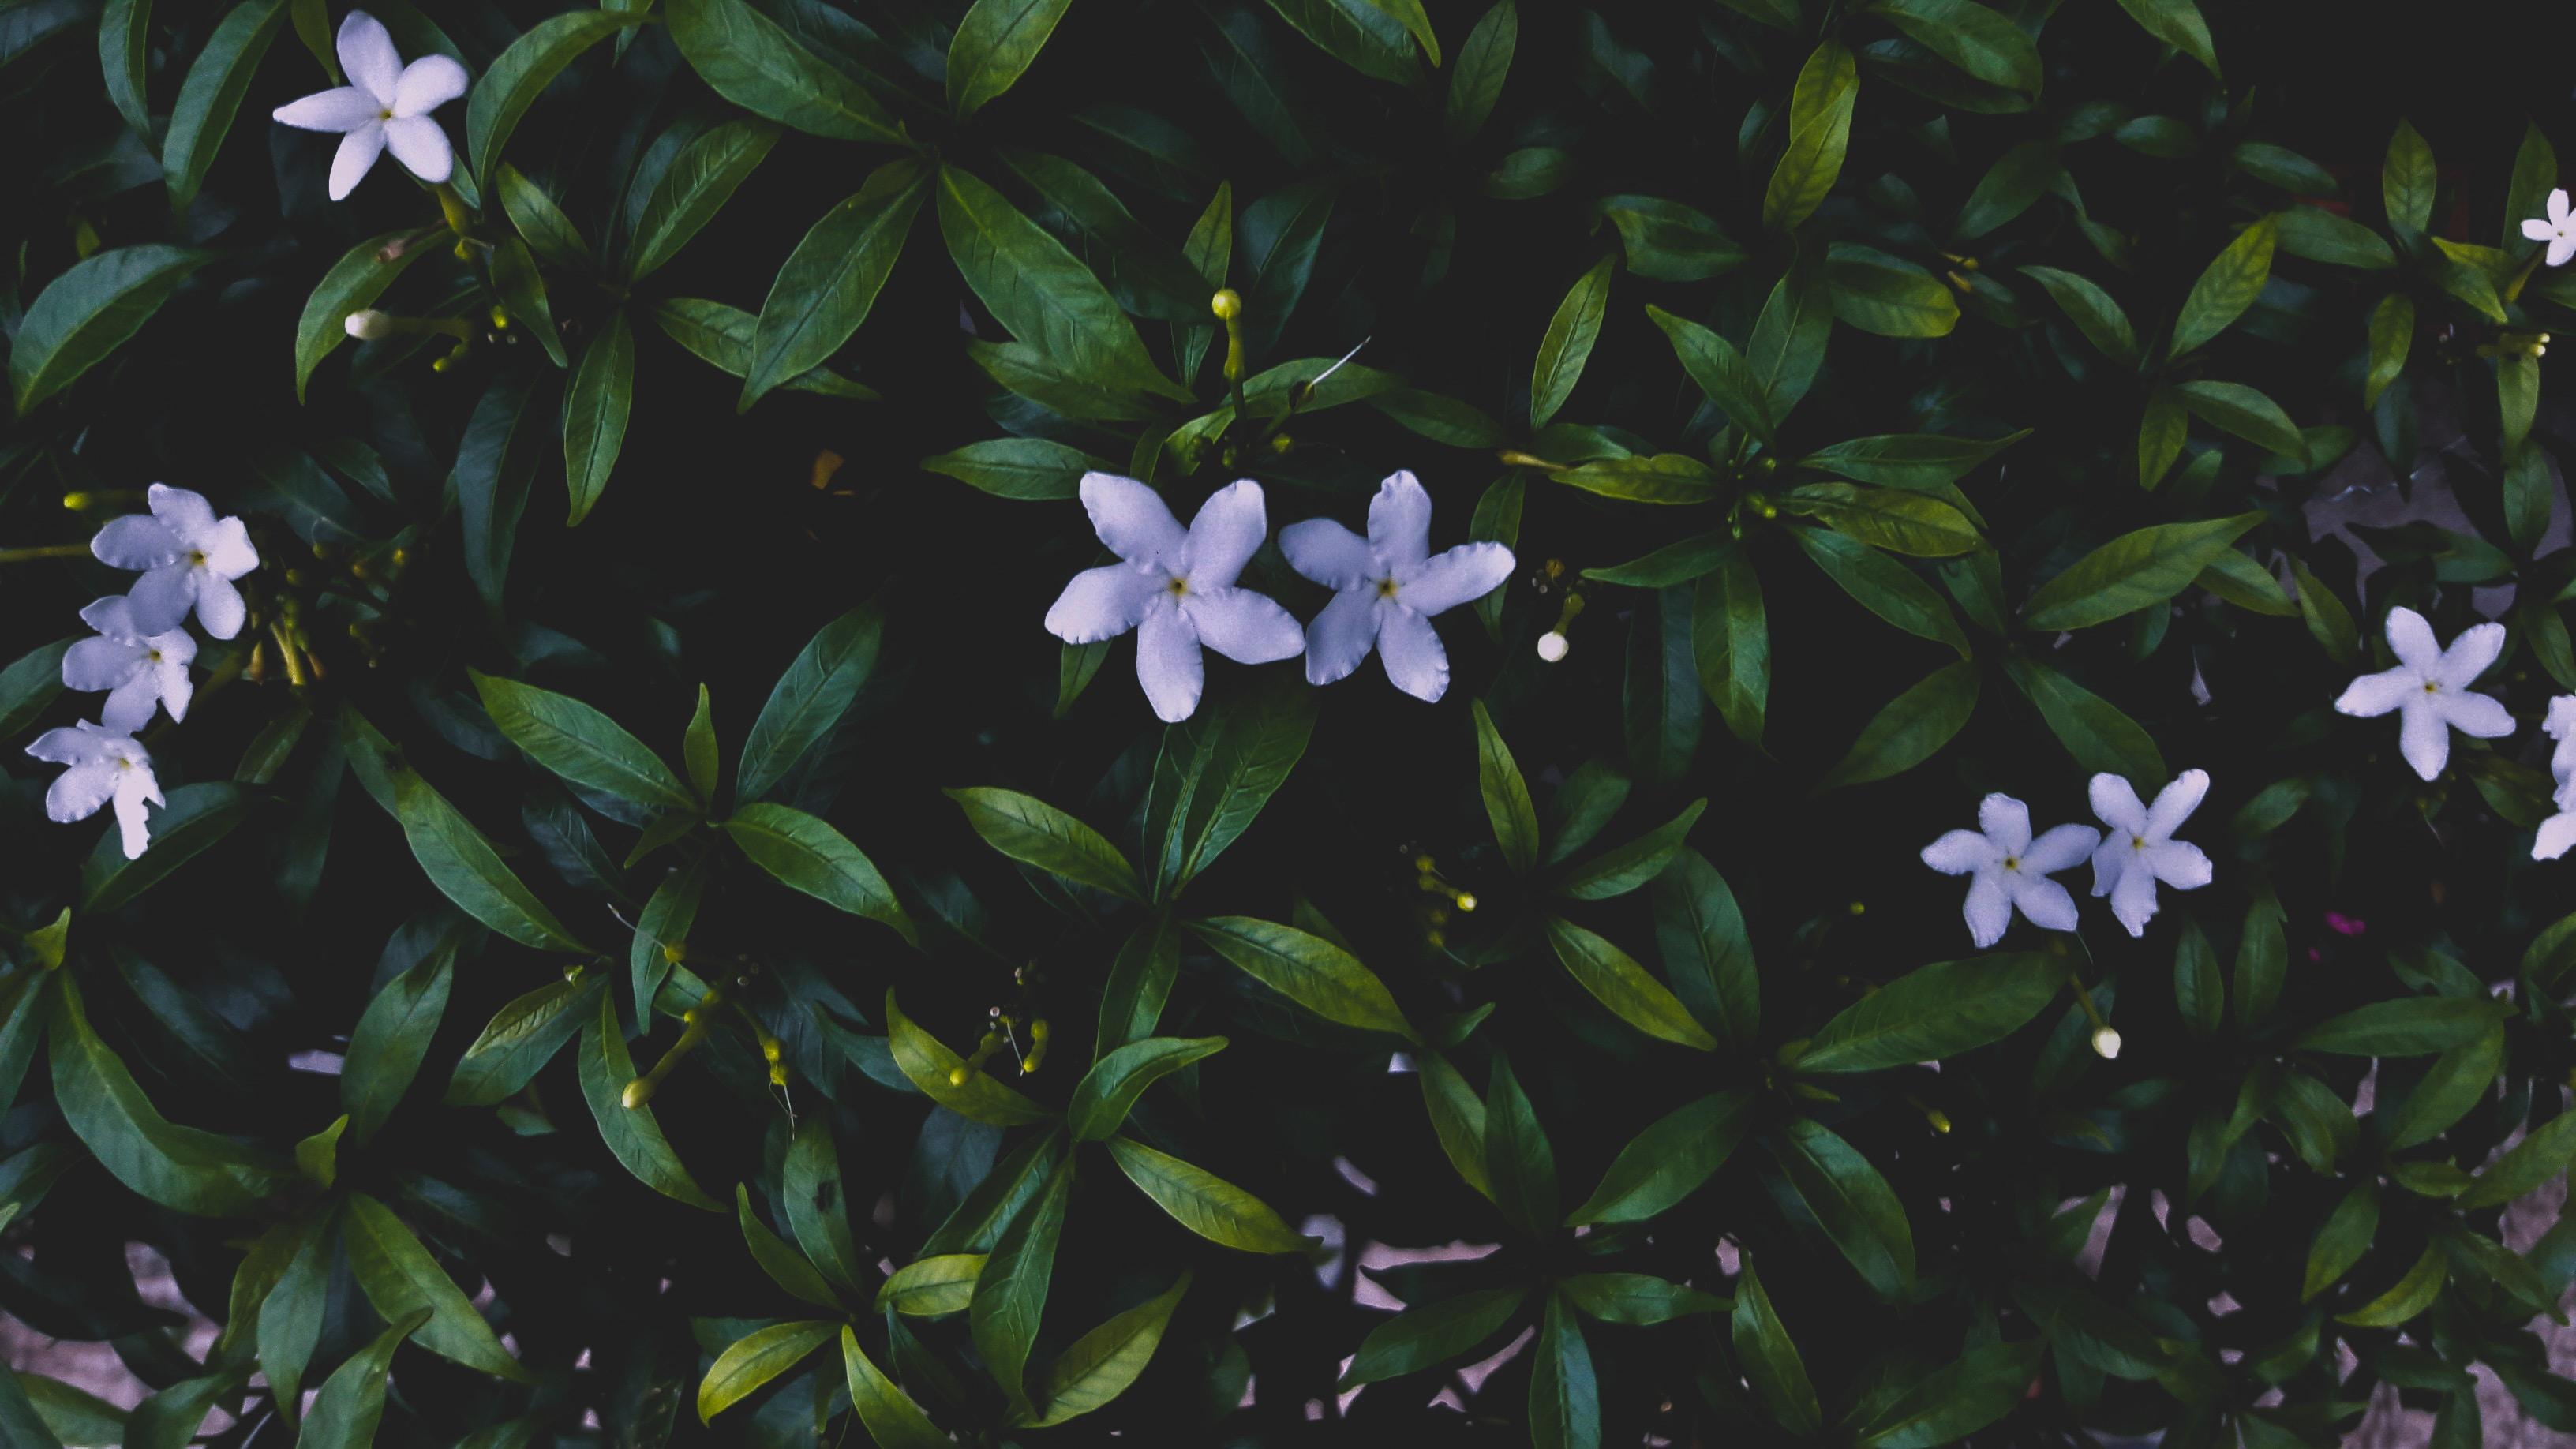 An overhead shot of white woodruff flowers